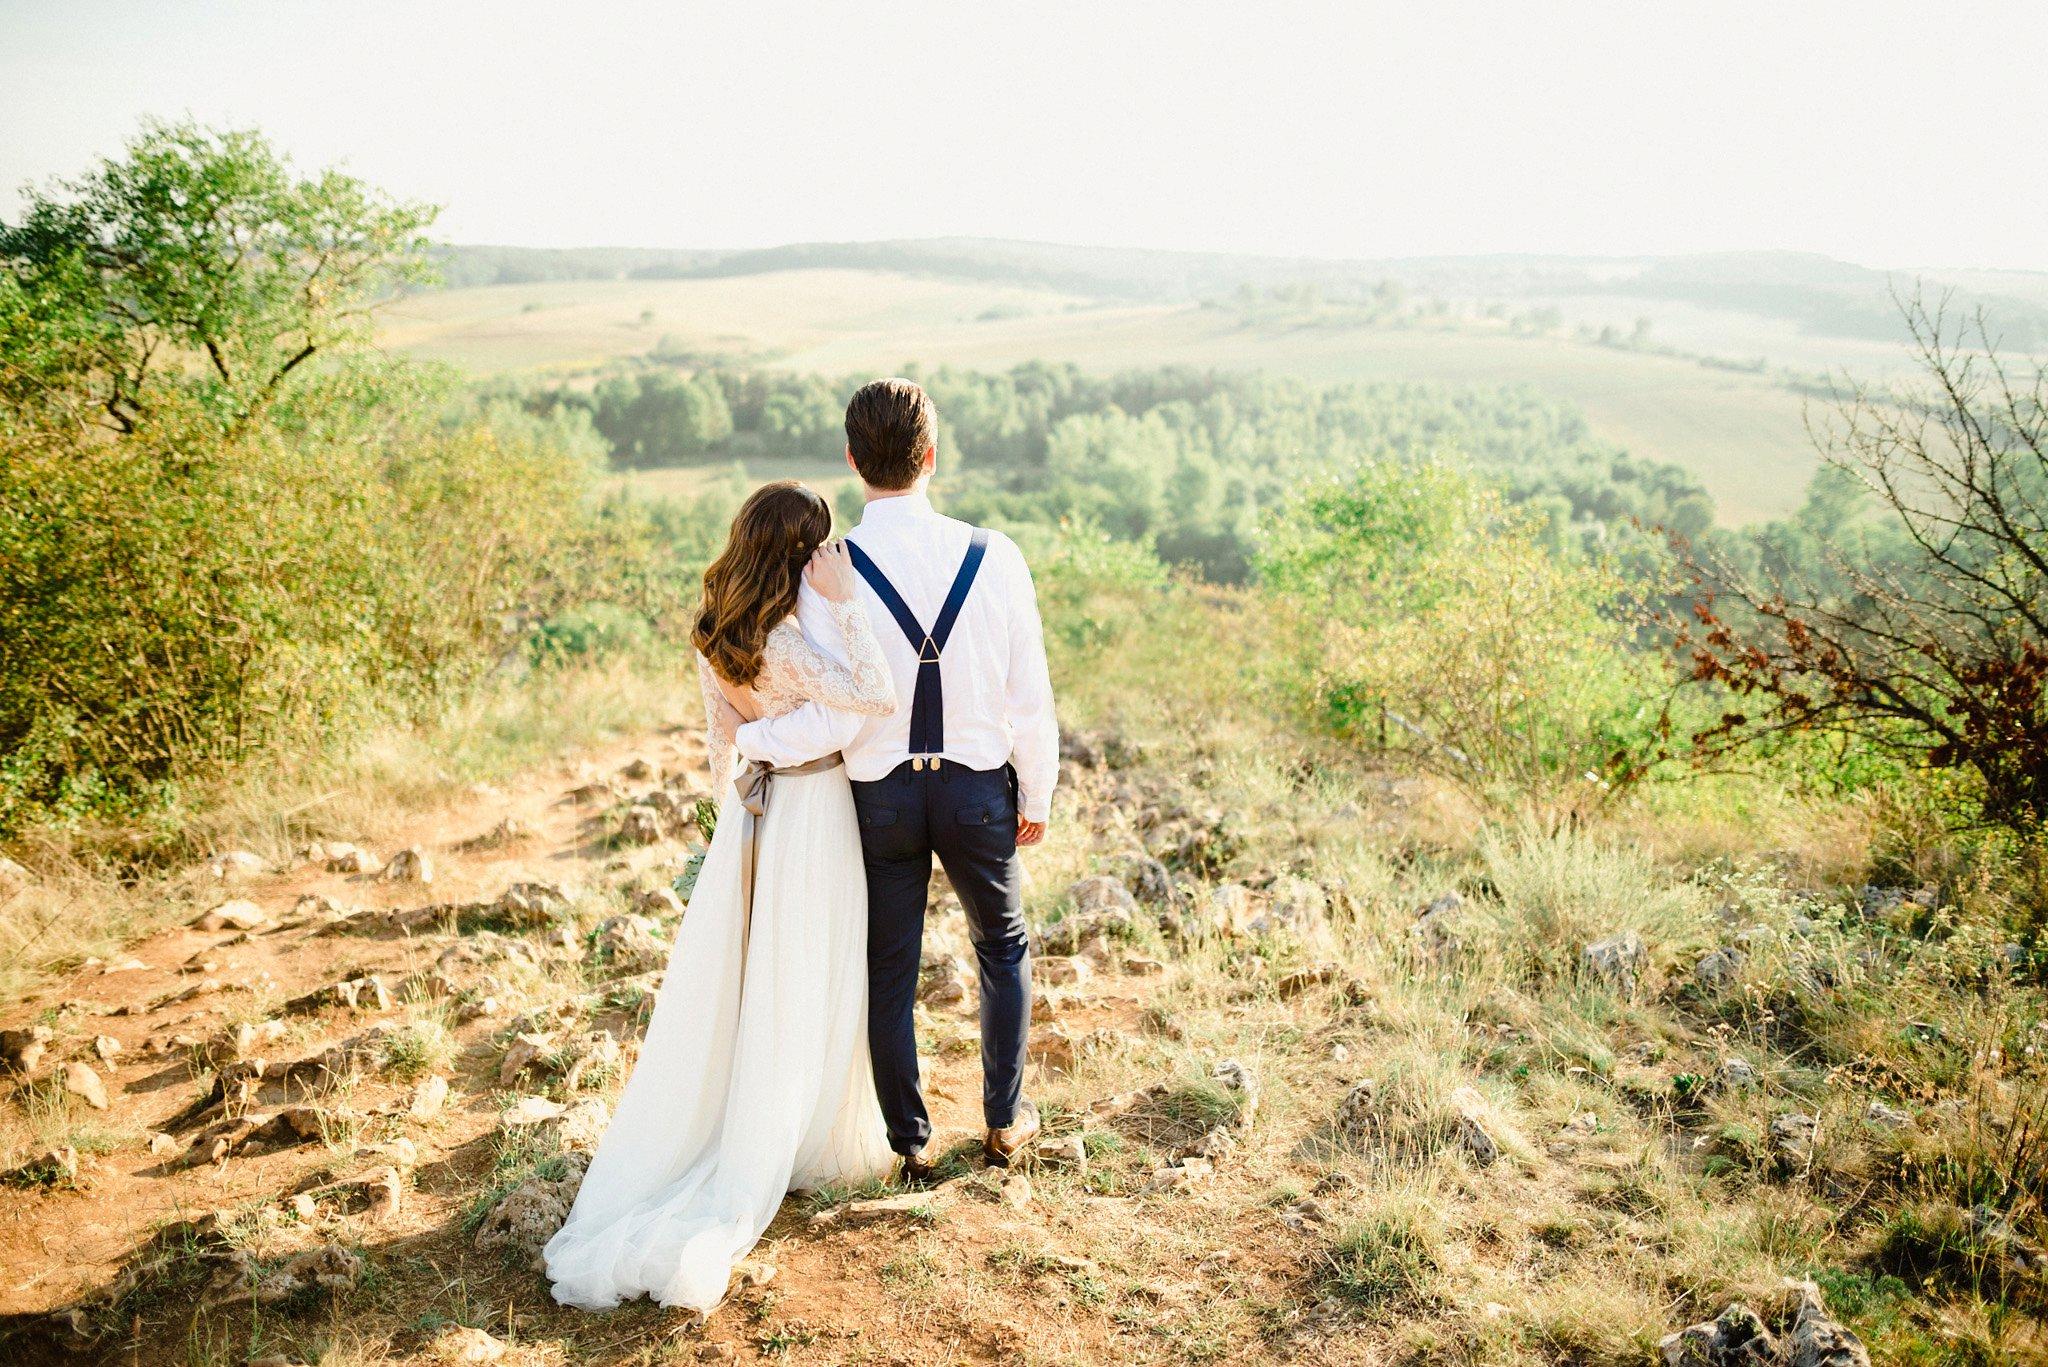 55-aggtelek-newlyweds-portrait